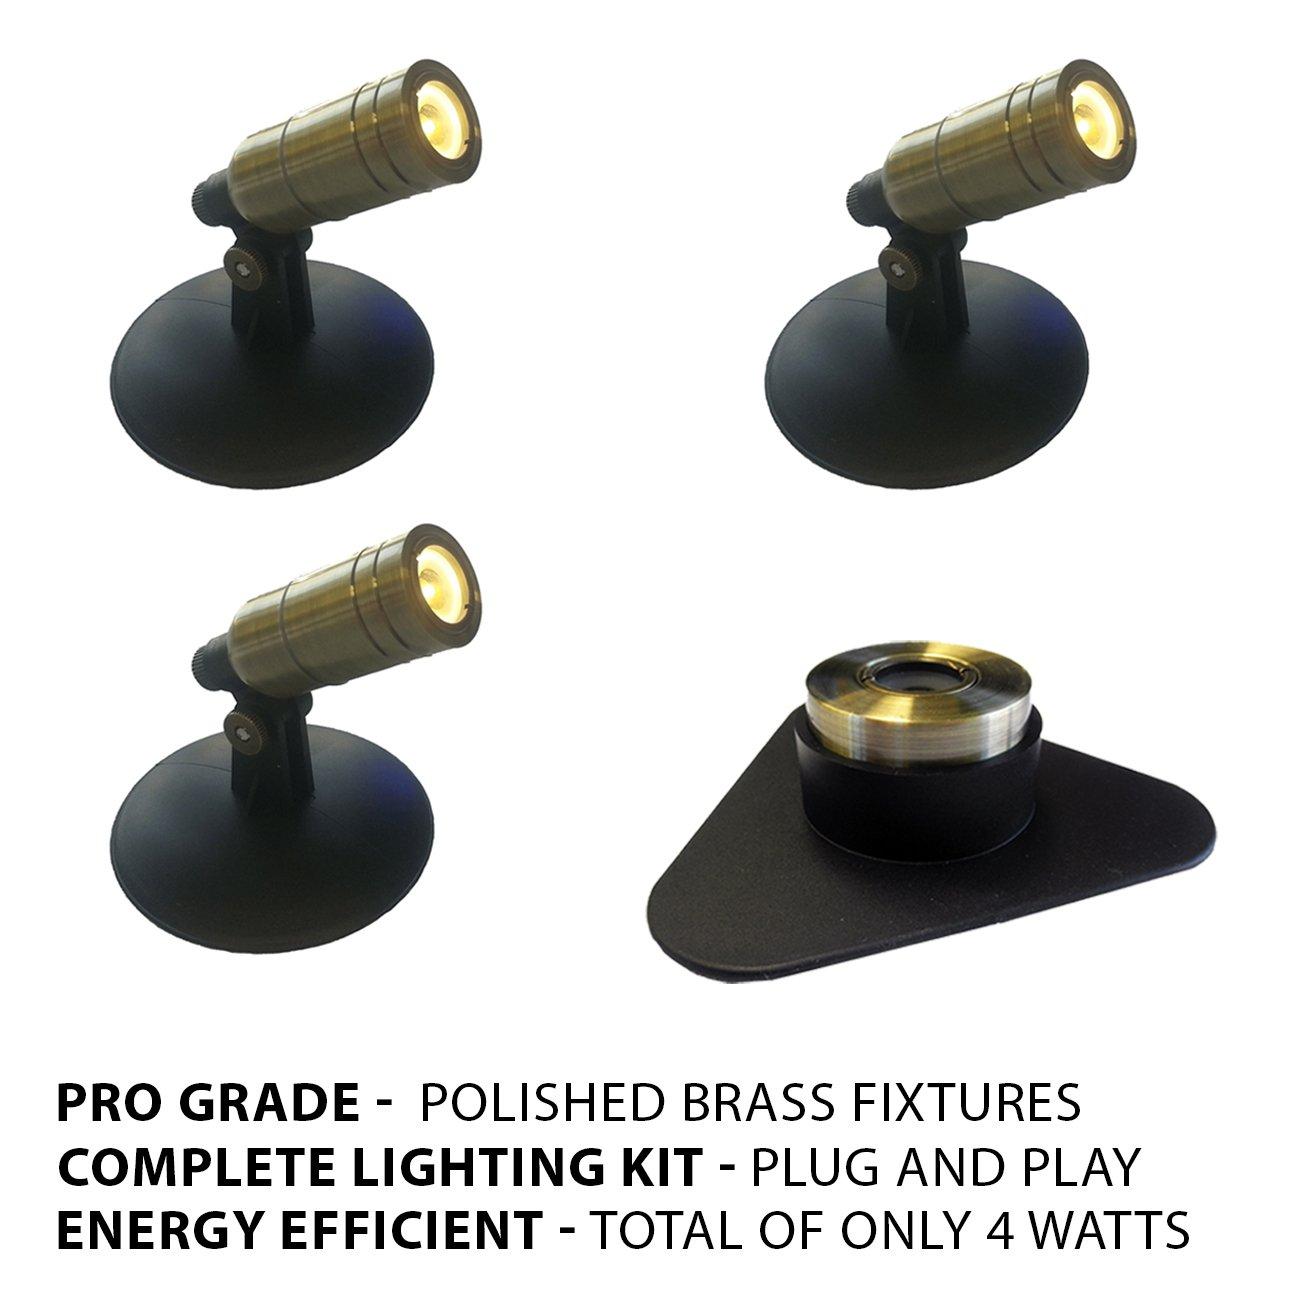 Patriot Brass LED Waterproof Pond and Landscape Lighting 4 Watt Light Kit P-B1 by Patriot